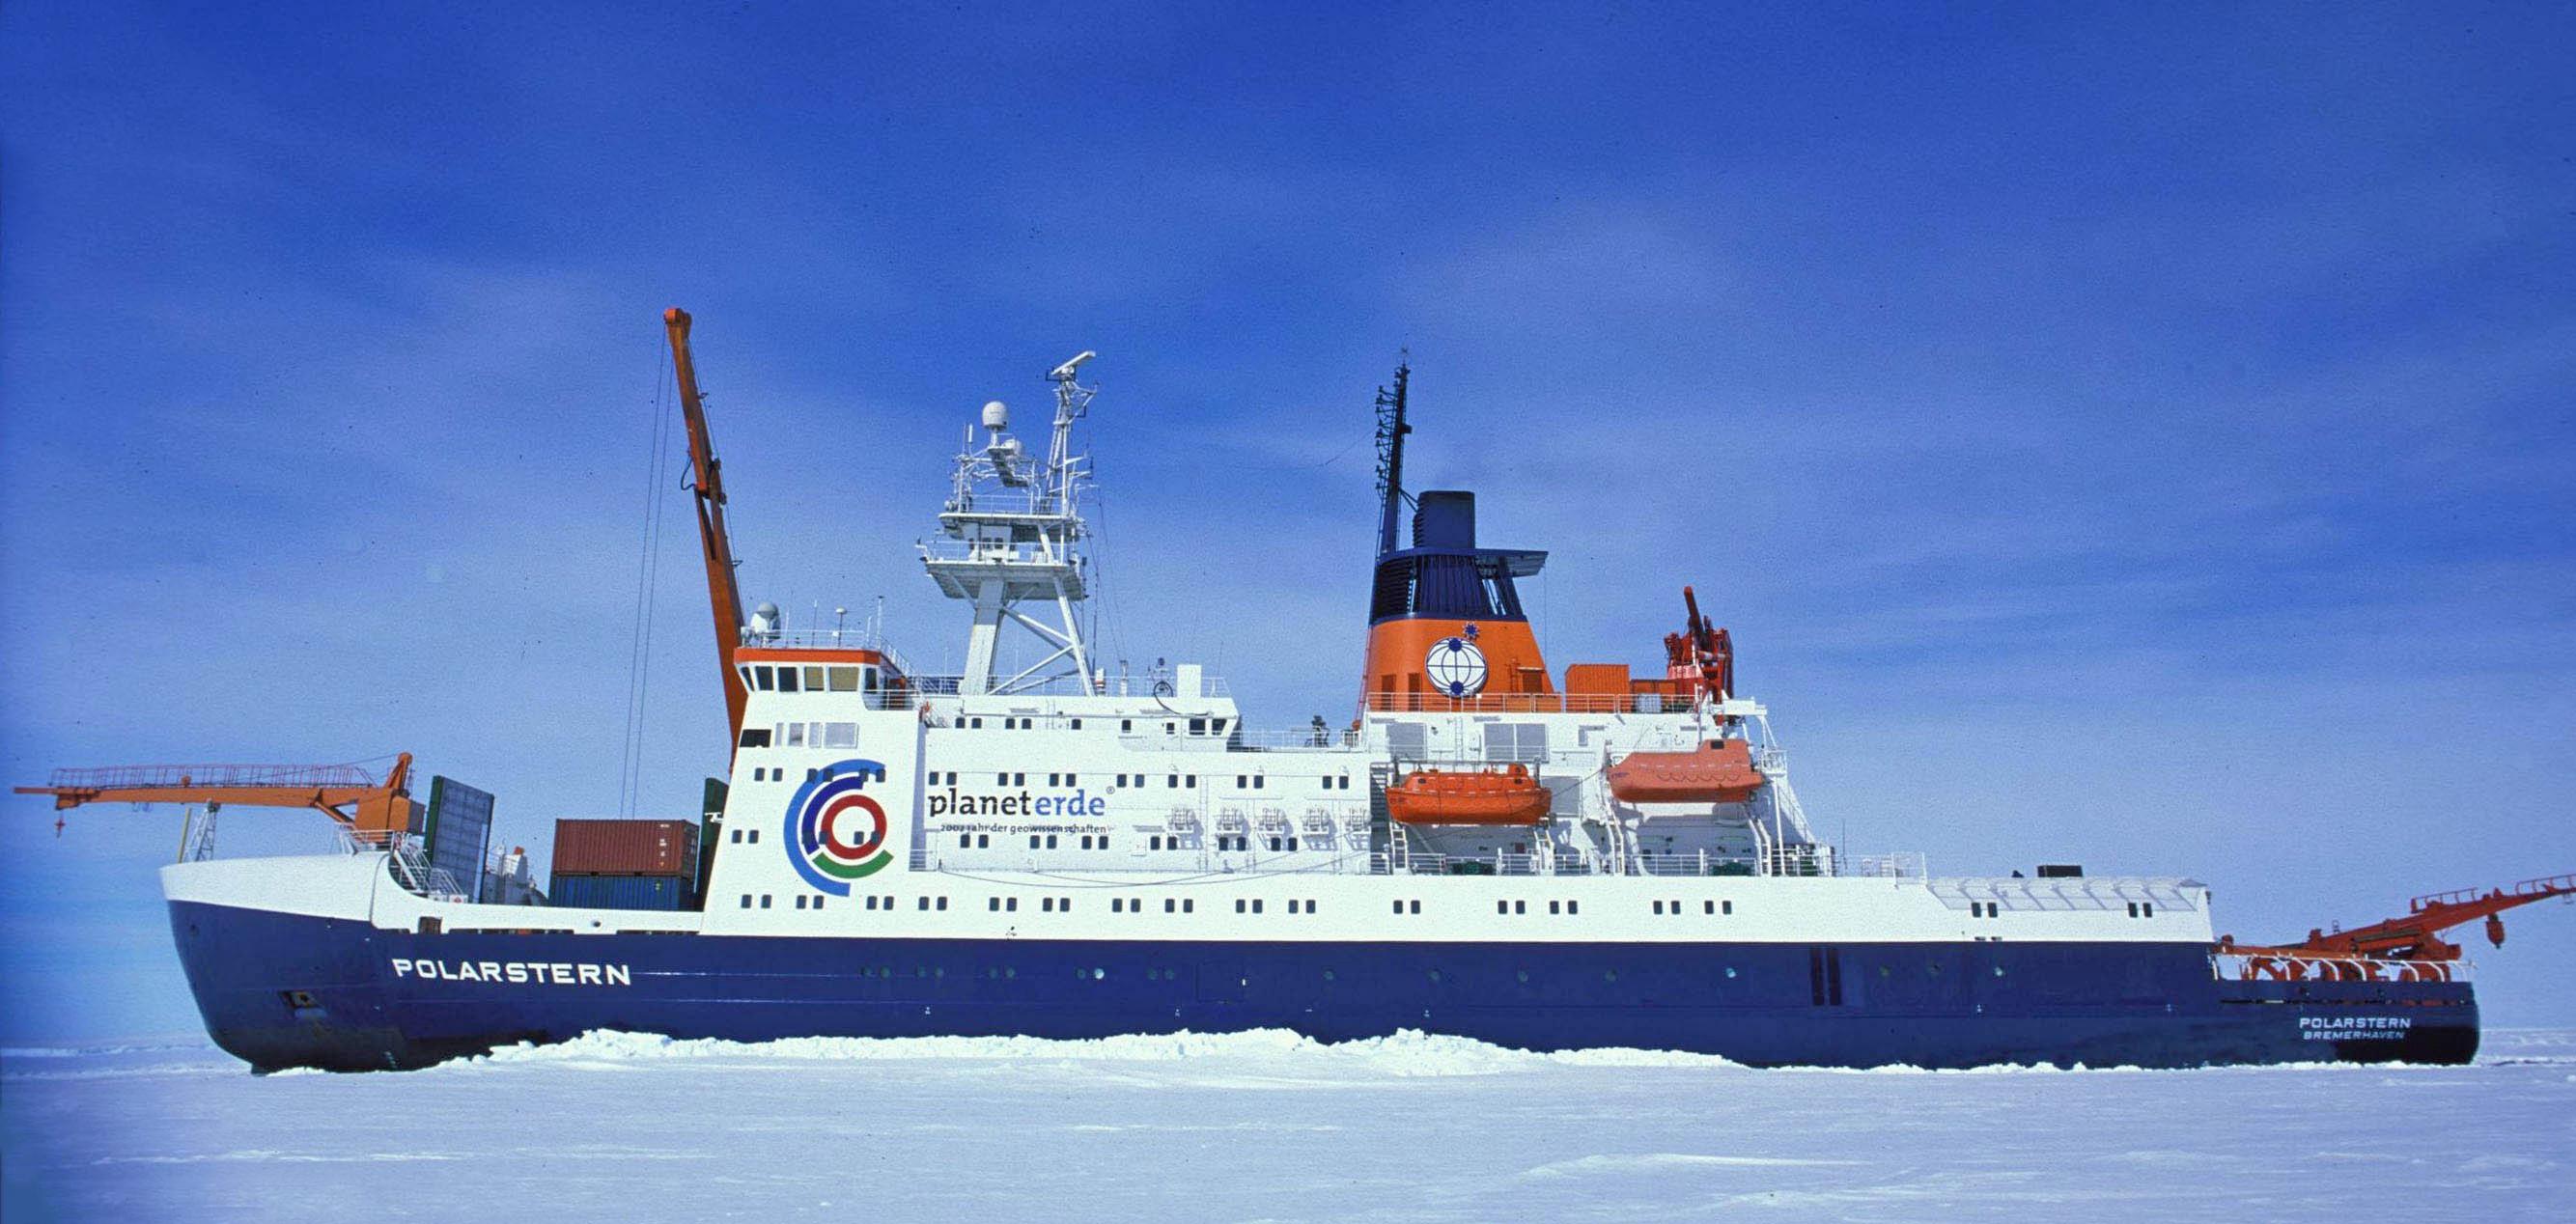 icebreaker meaning